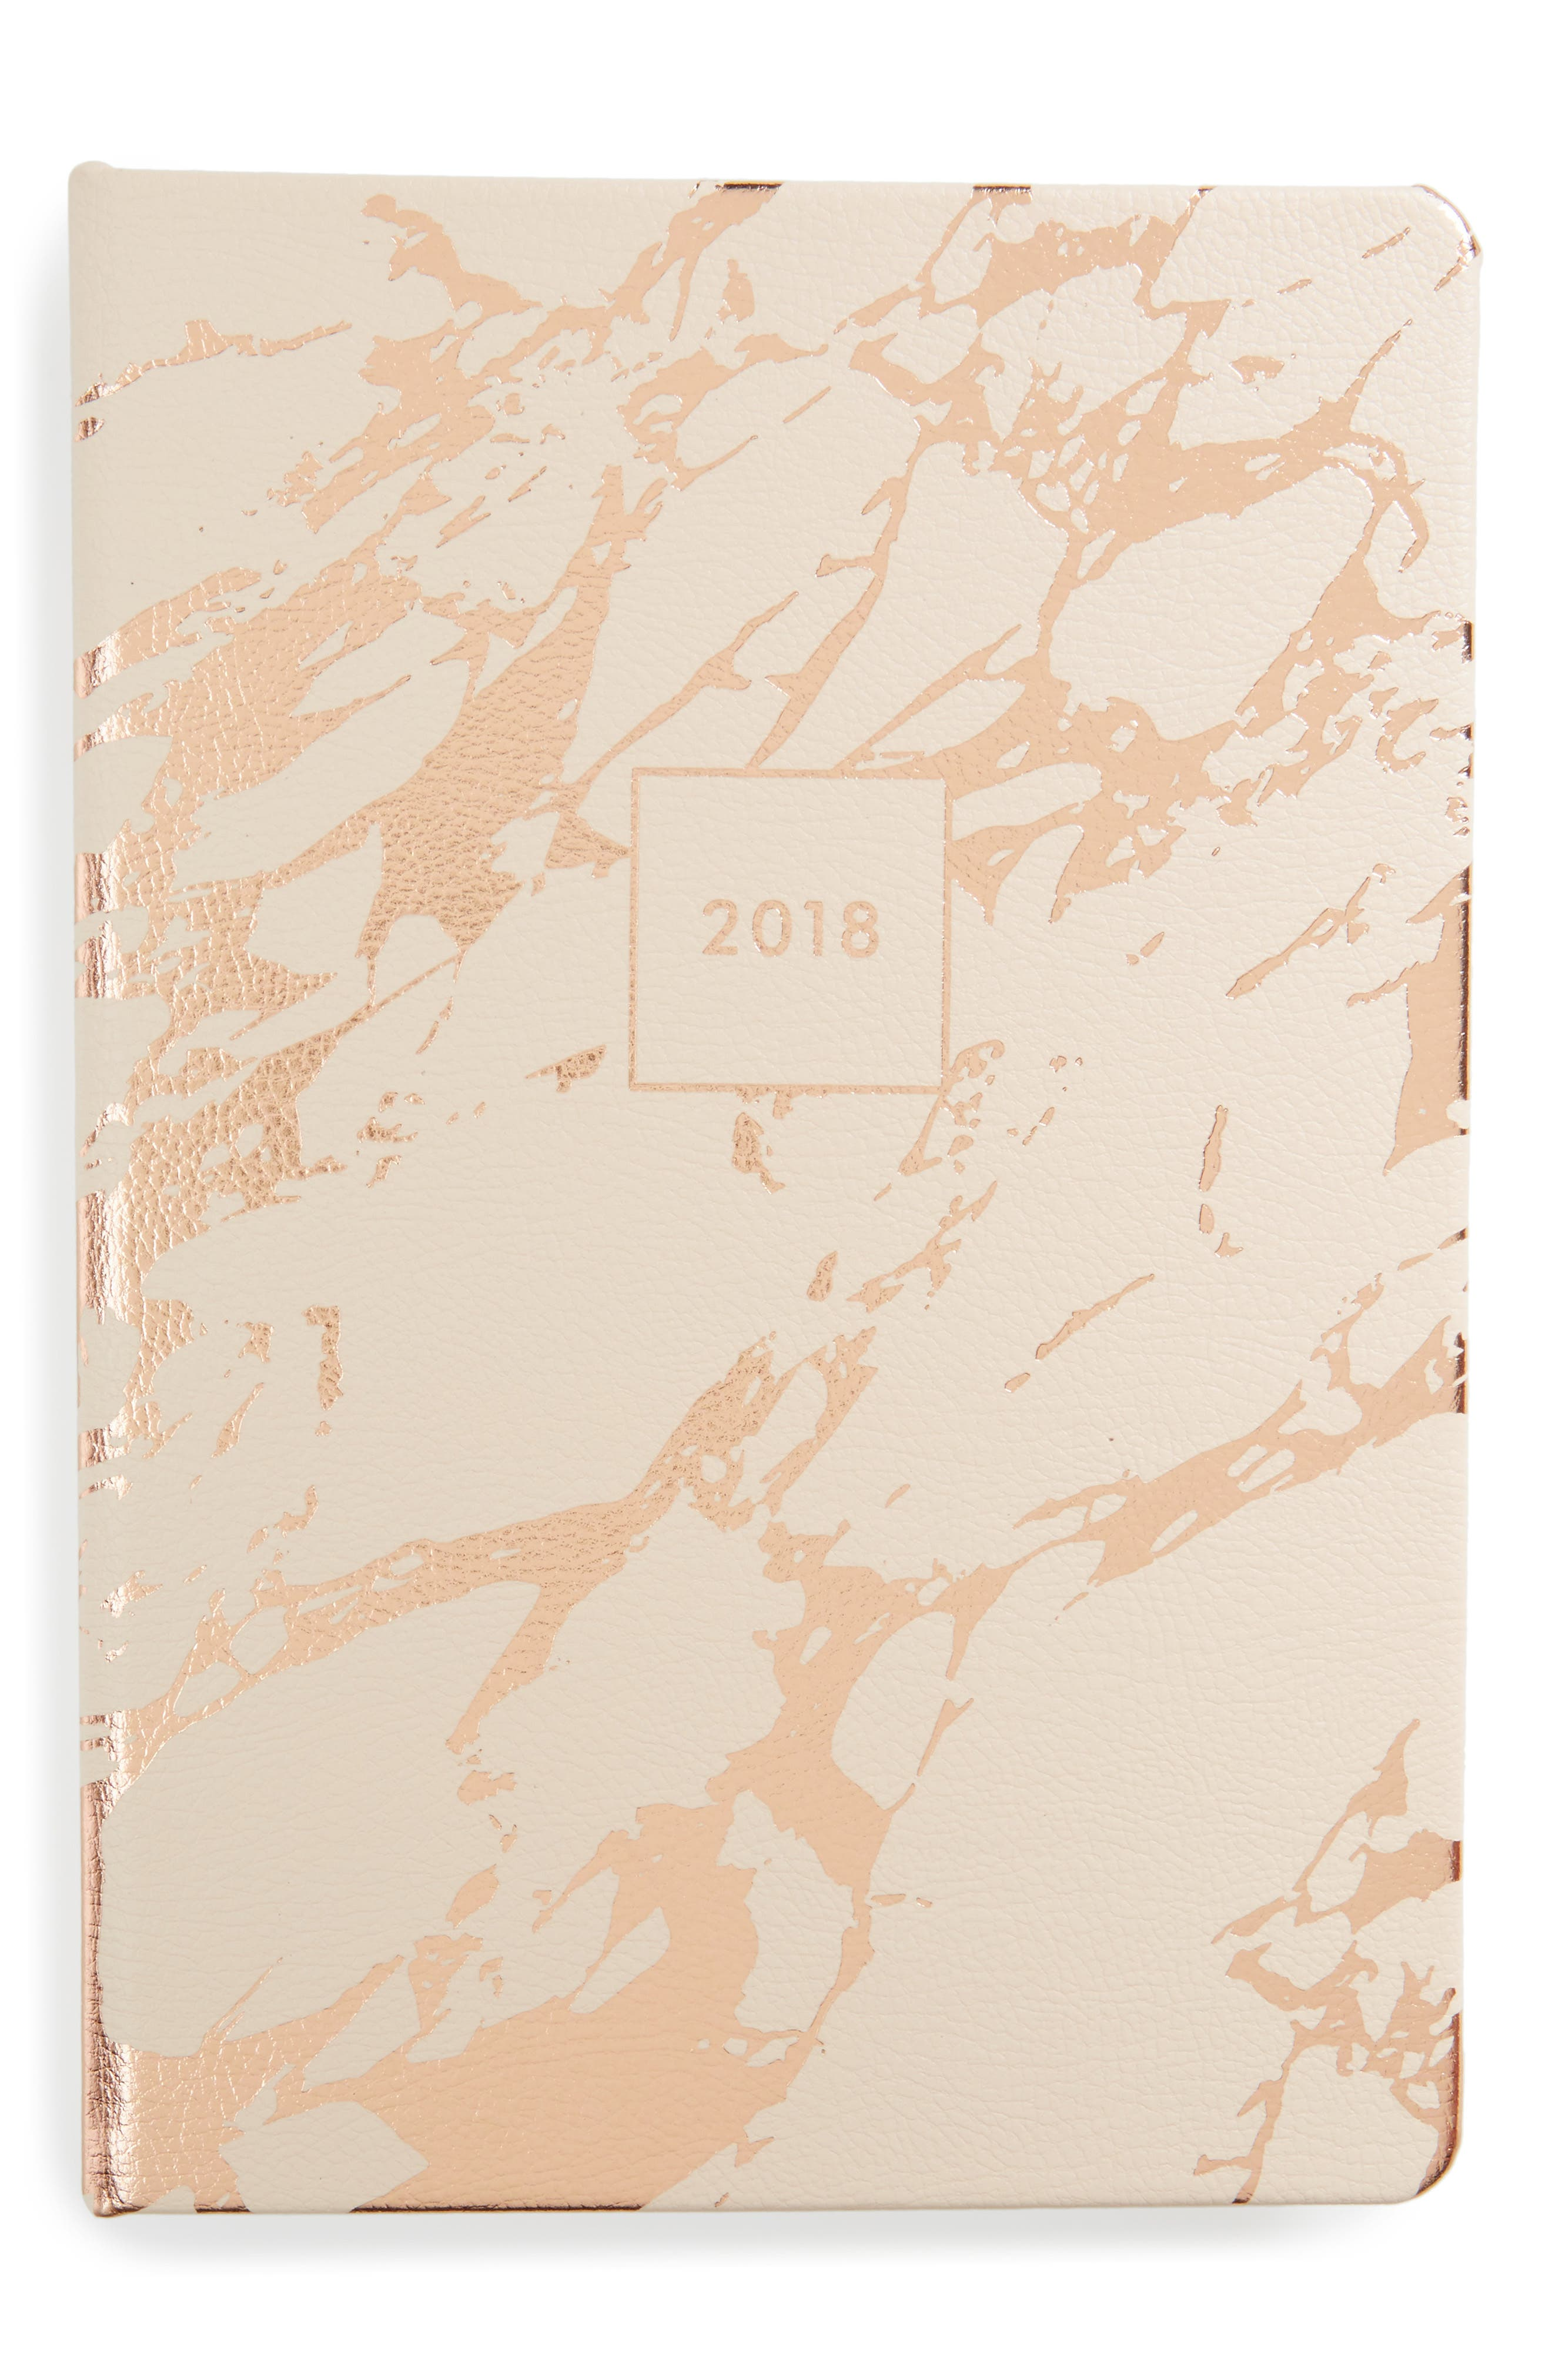 Alternate Image 1 Selected - Fringe Studio Blush Marble 17-Month Agenda